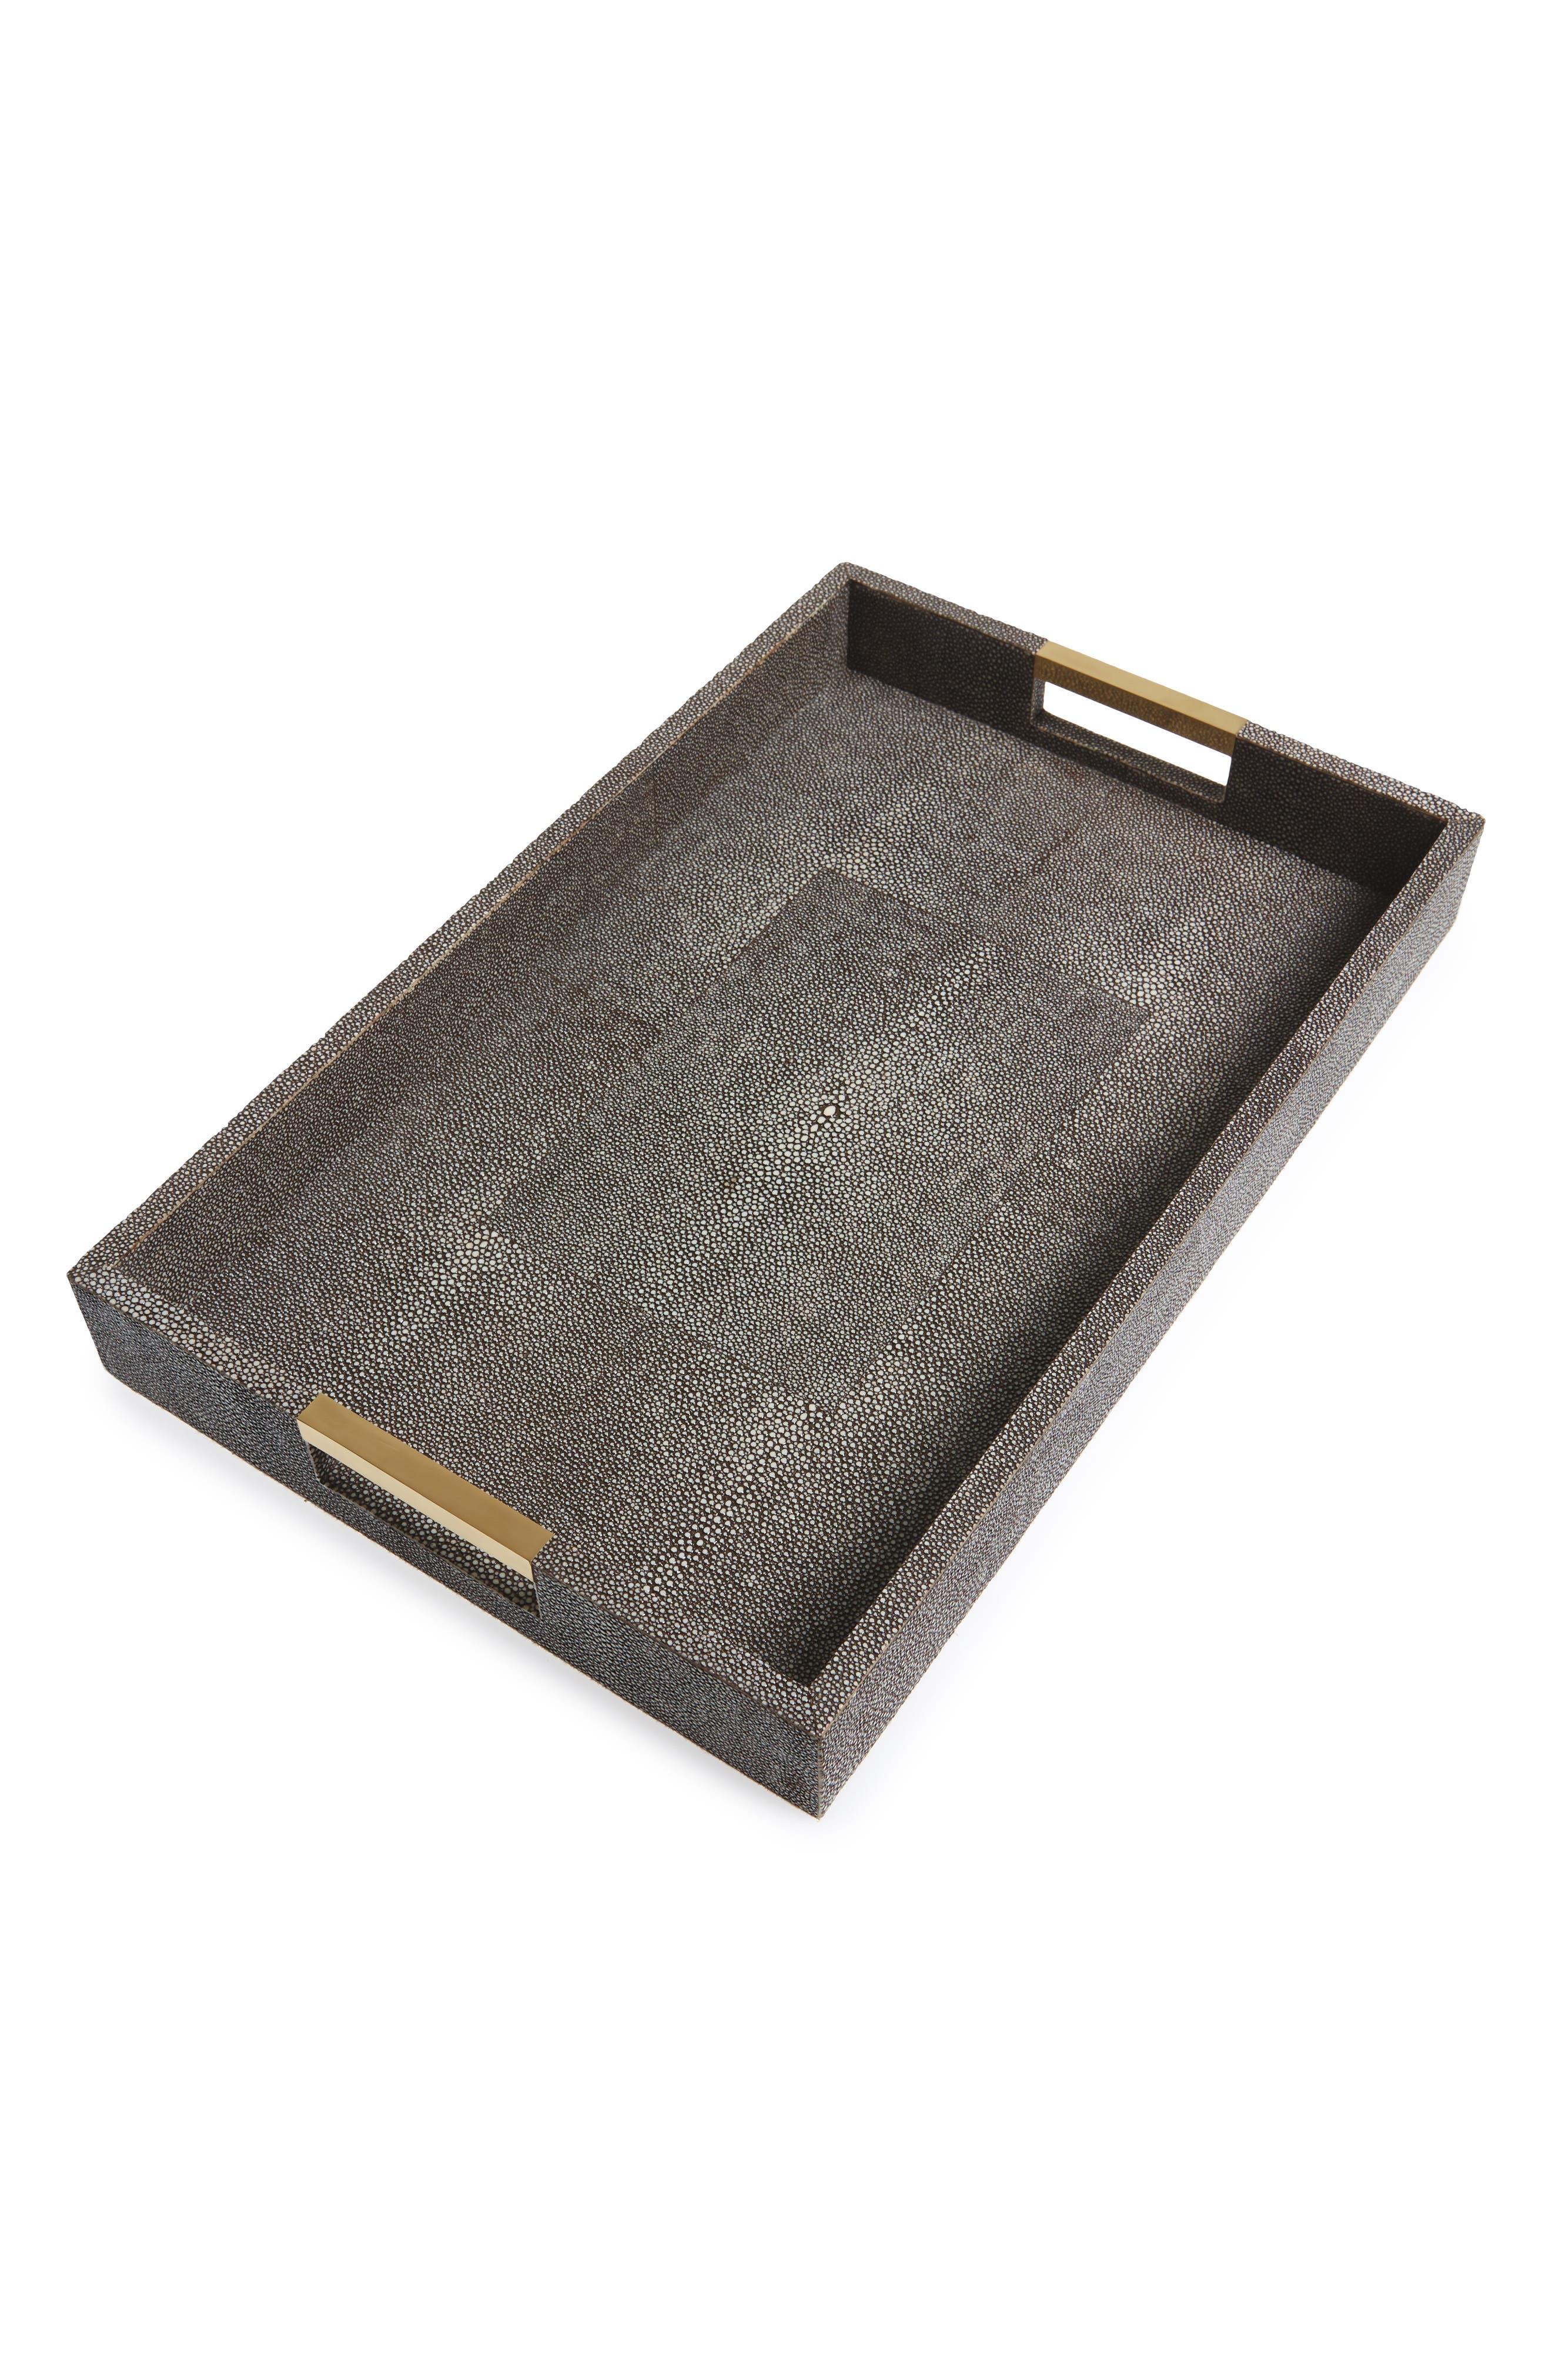 Modern Shagreen Desk Tray,                         Main,                         color, BROWN